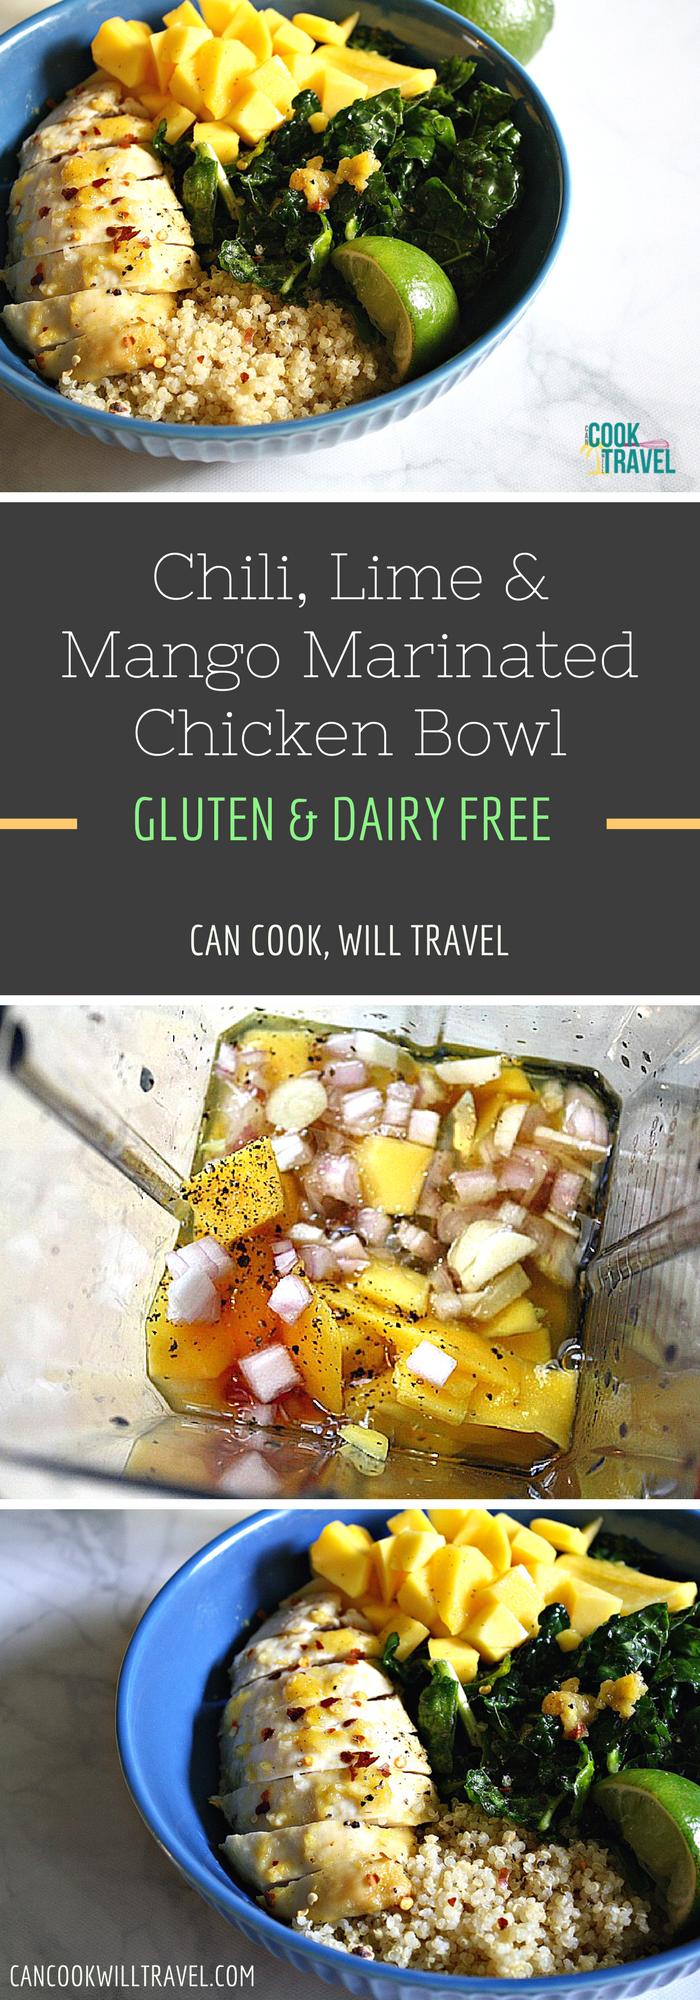 Mango Marinated Chicken Bowl_Collage2